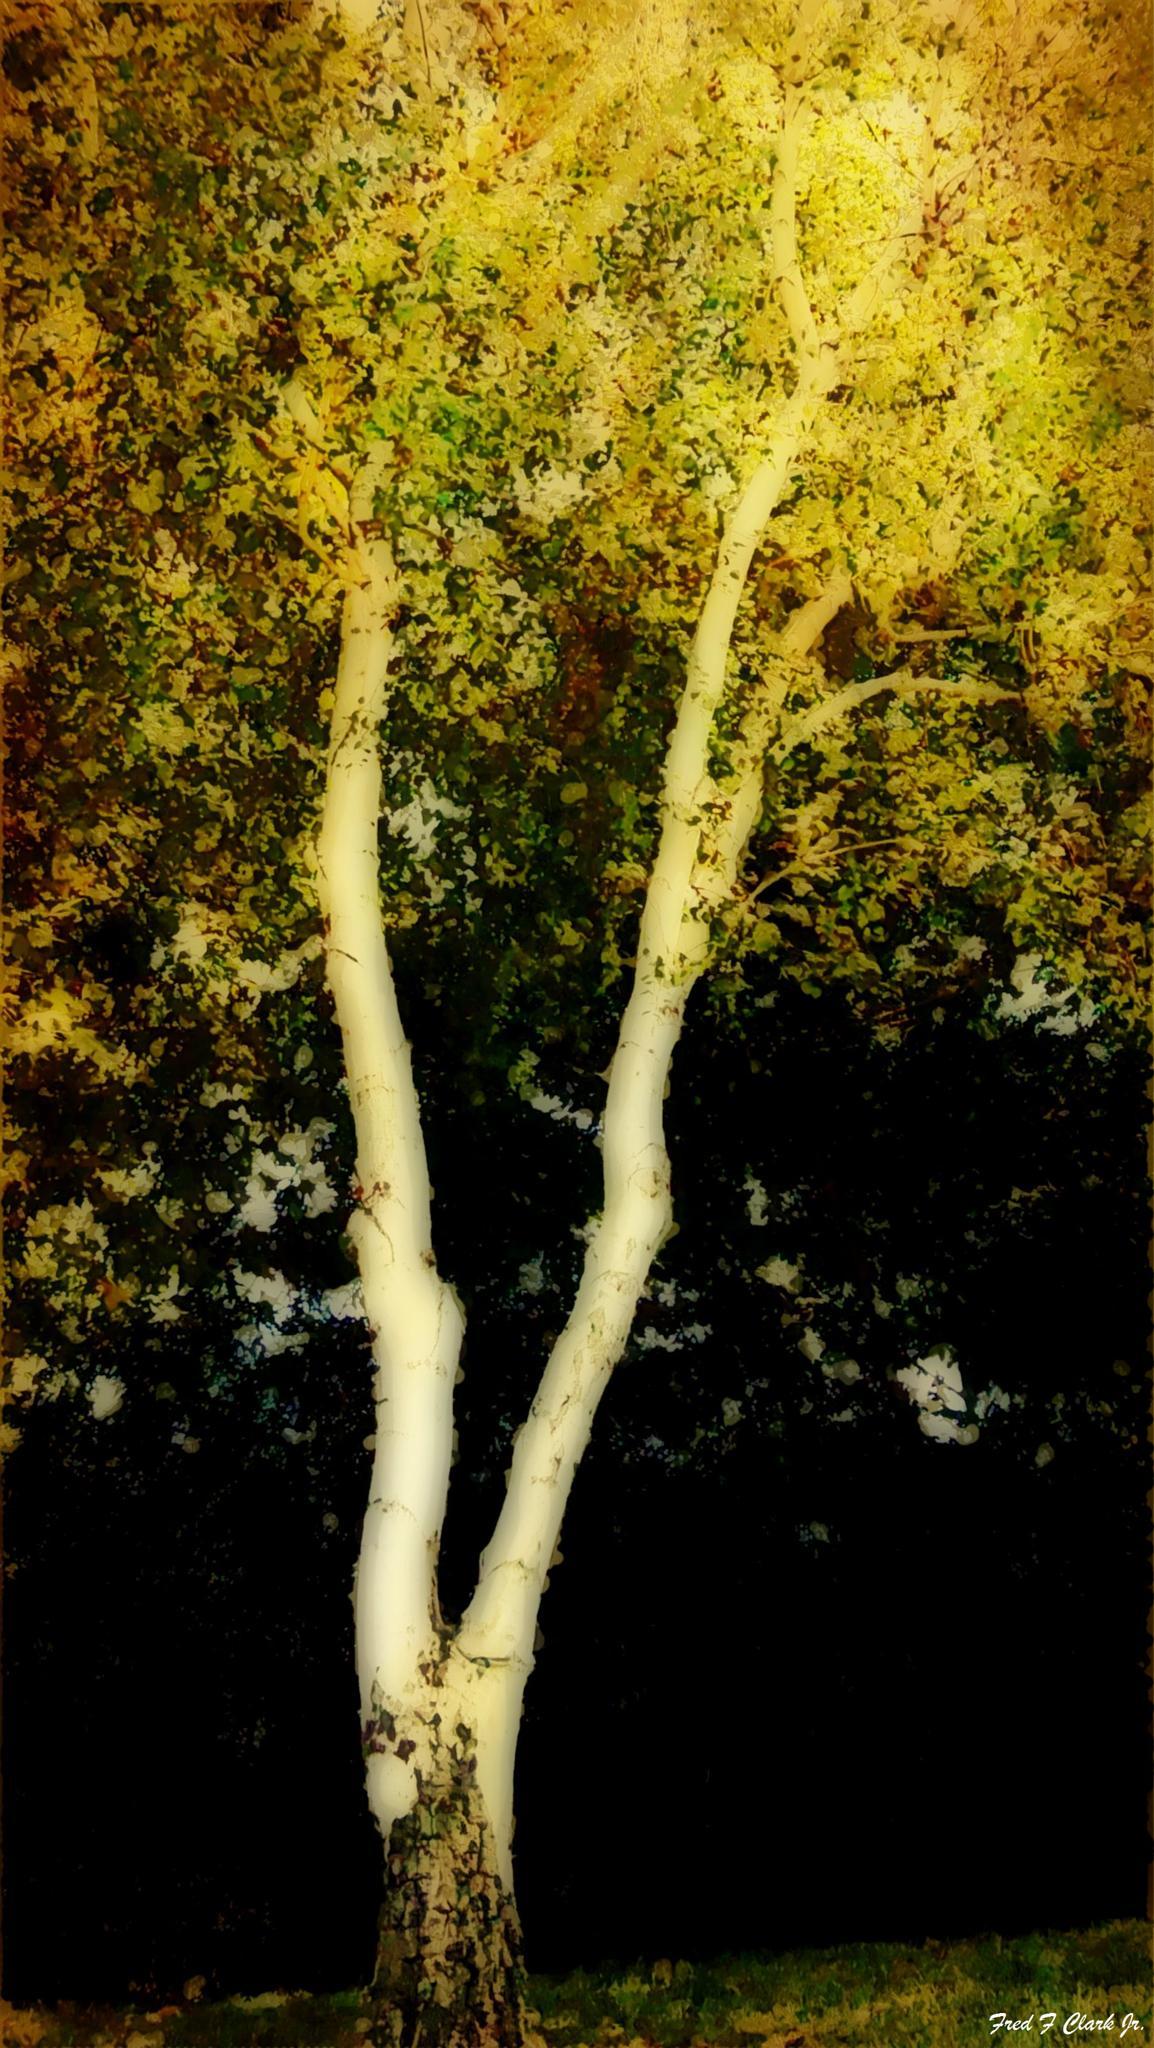 Birch Tree 2 by fred.clark.359